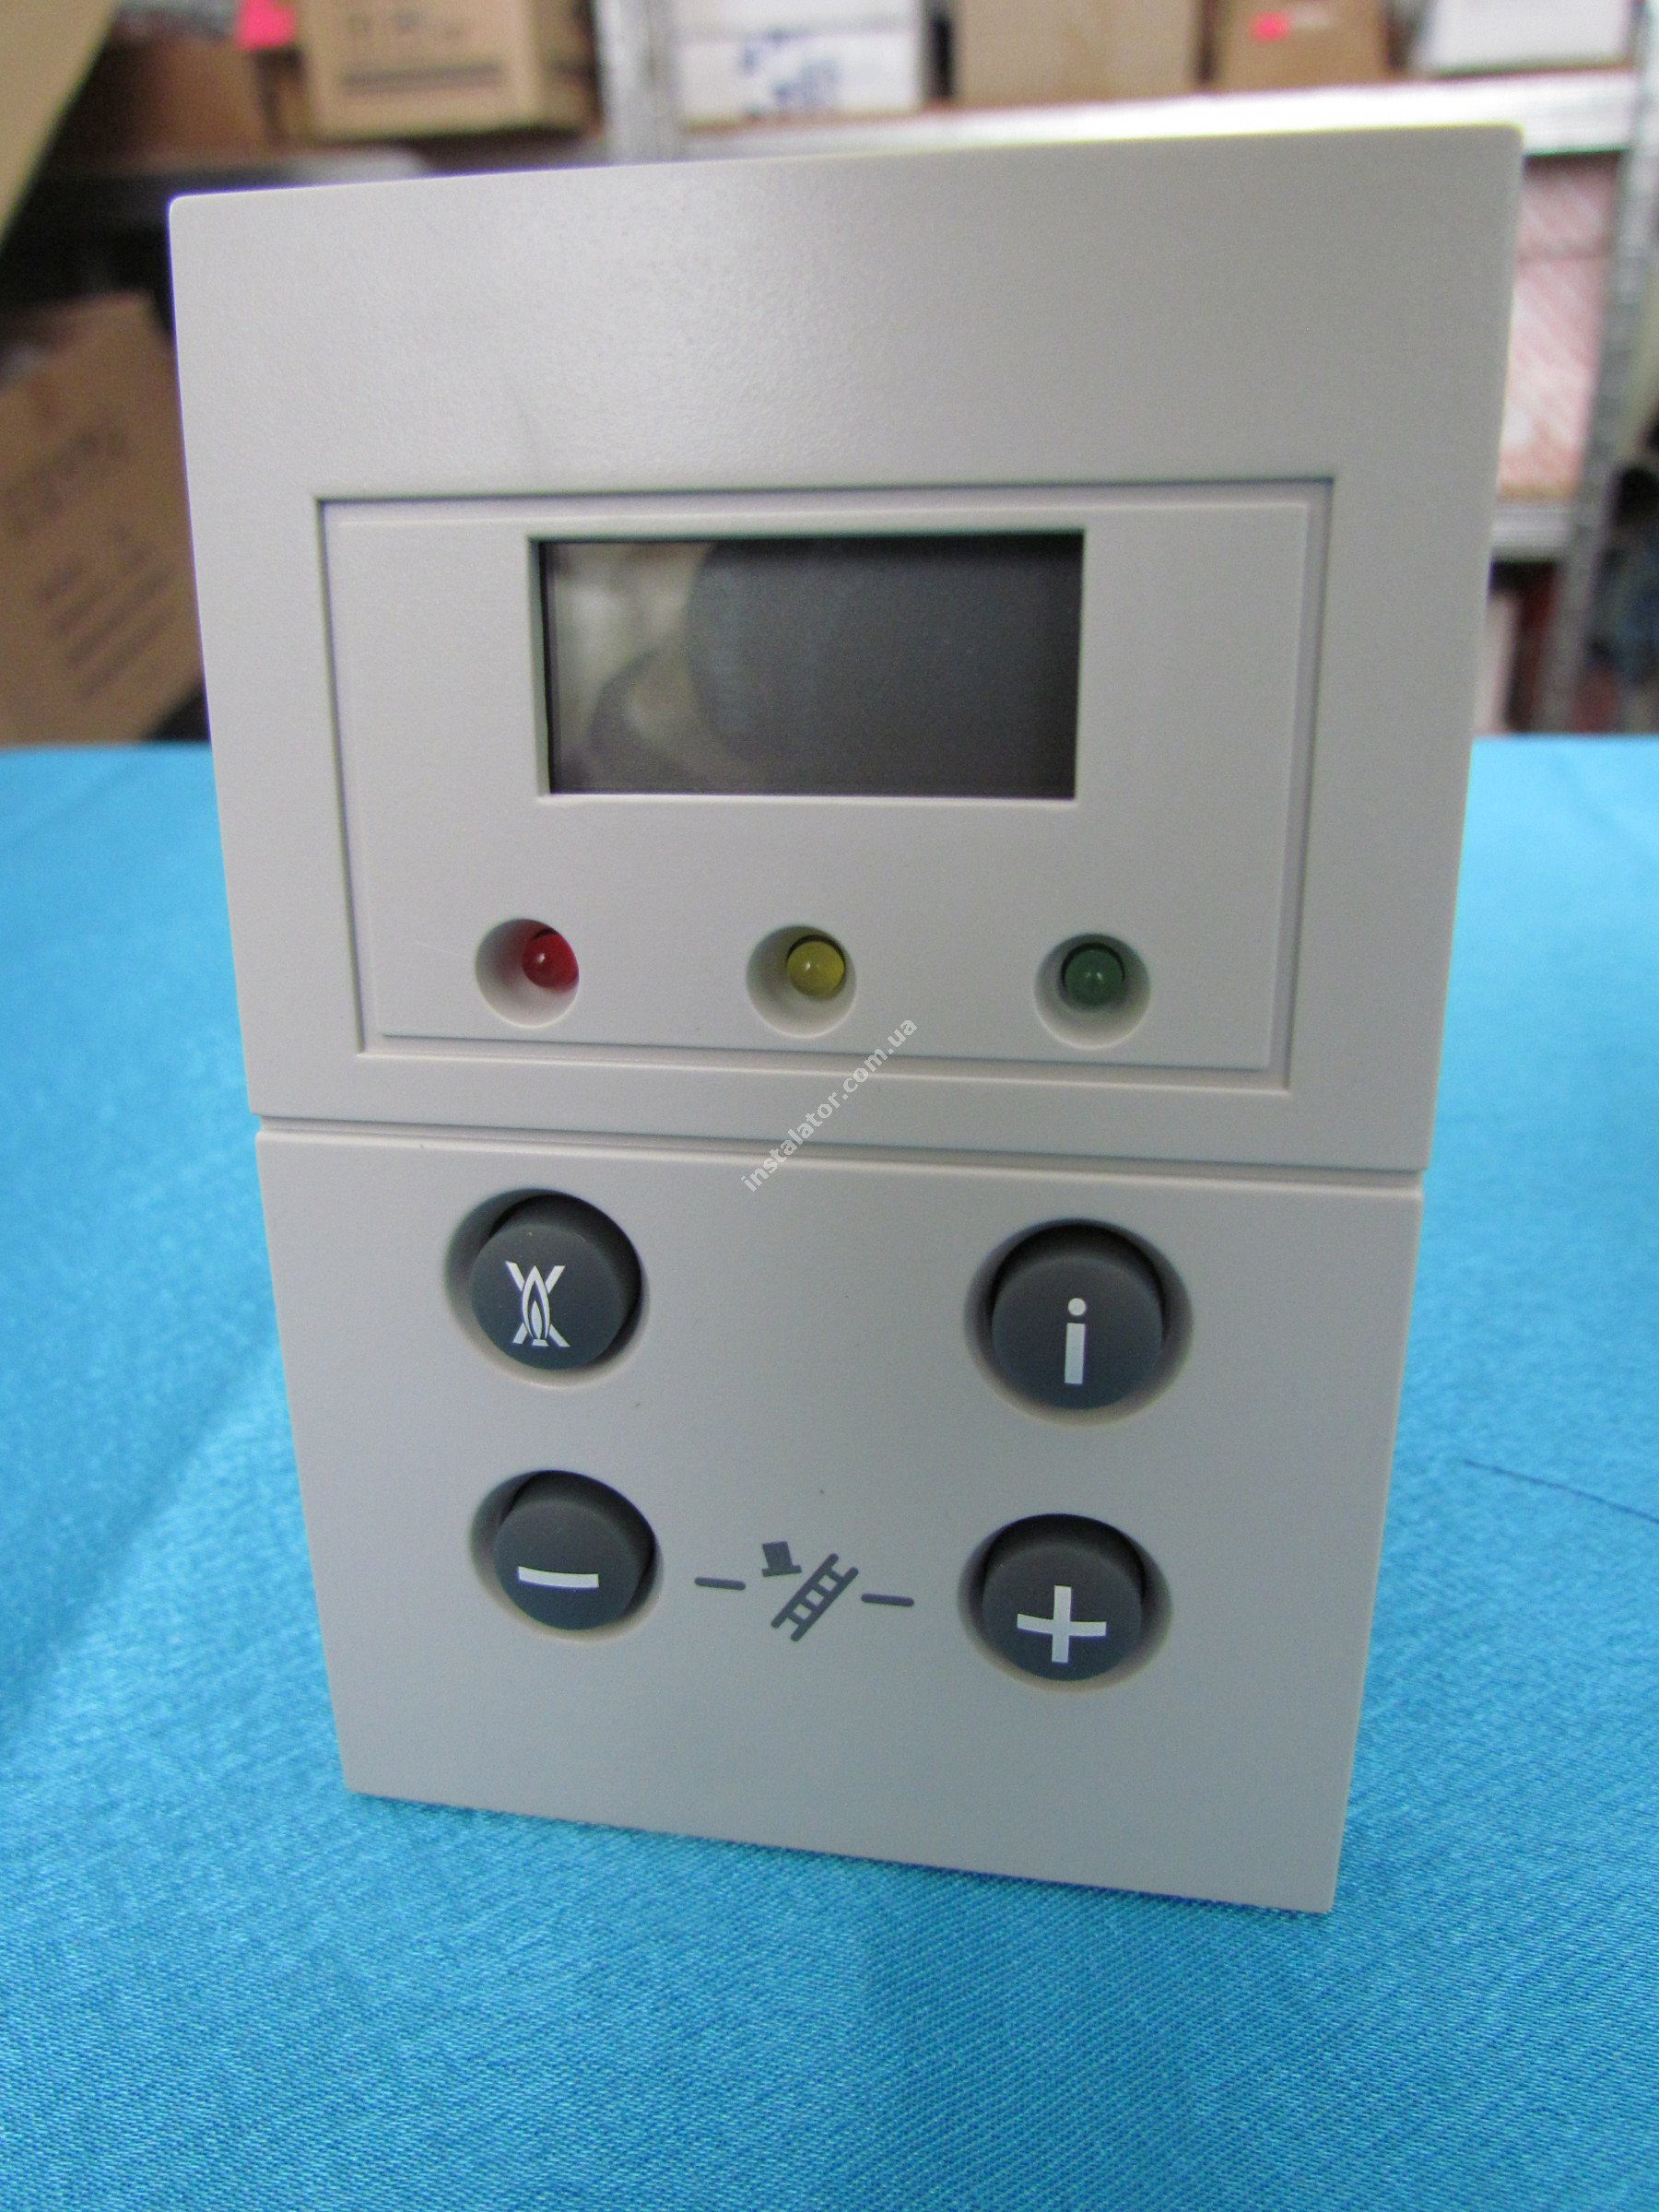 0020040154 Плата дисплея VAILLANT TEC R1, TEC-PRO-mini R1  full-image-0